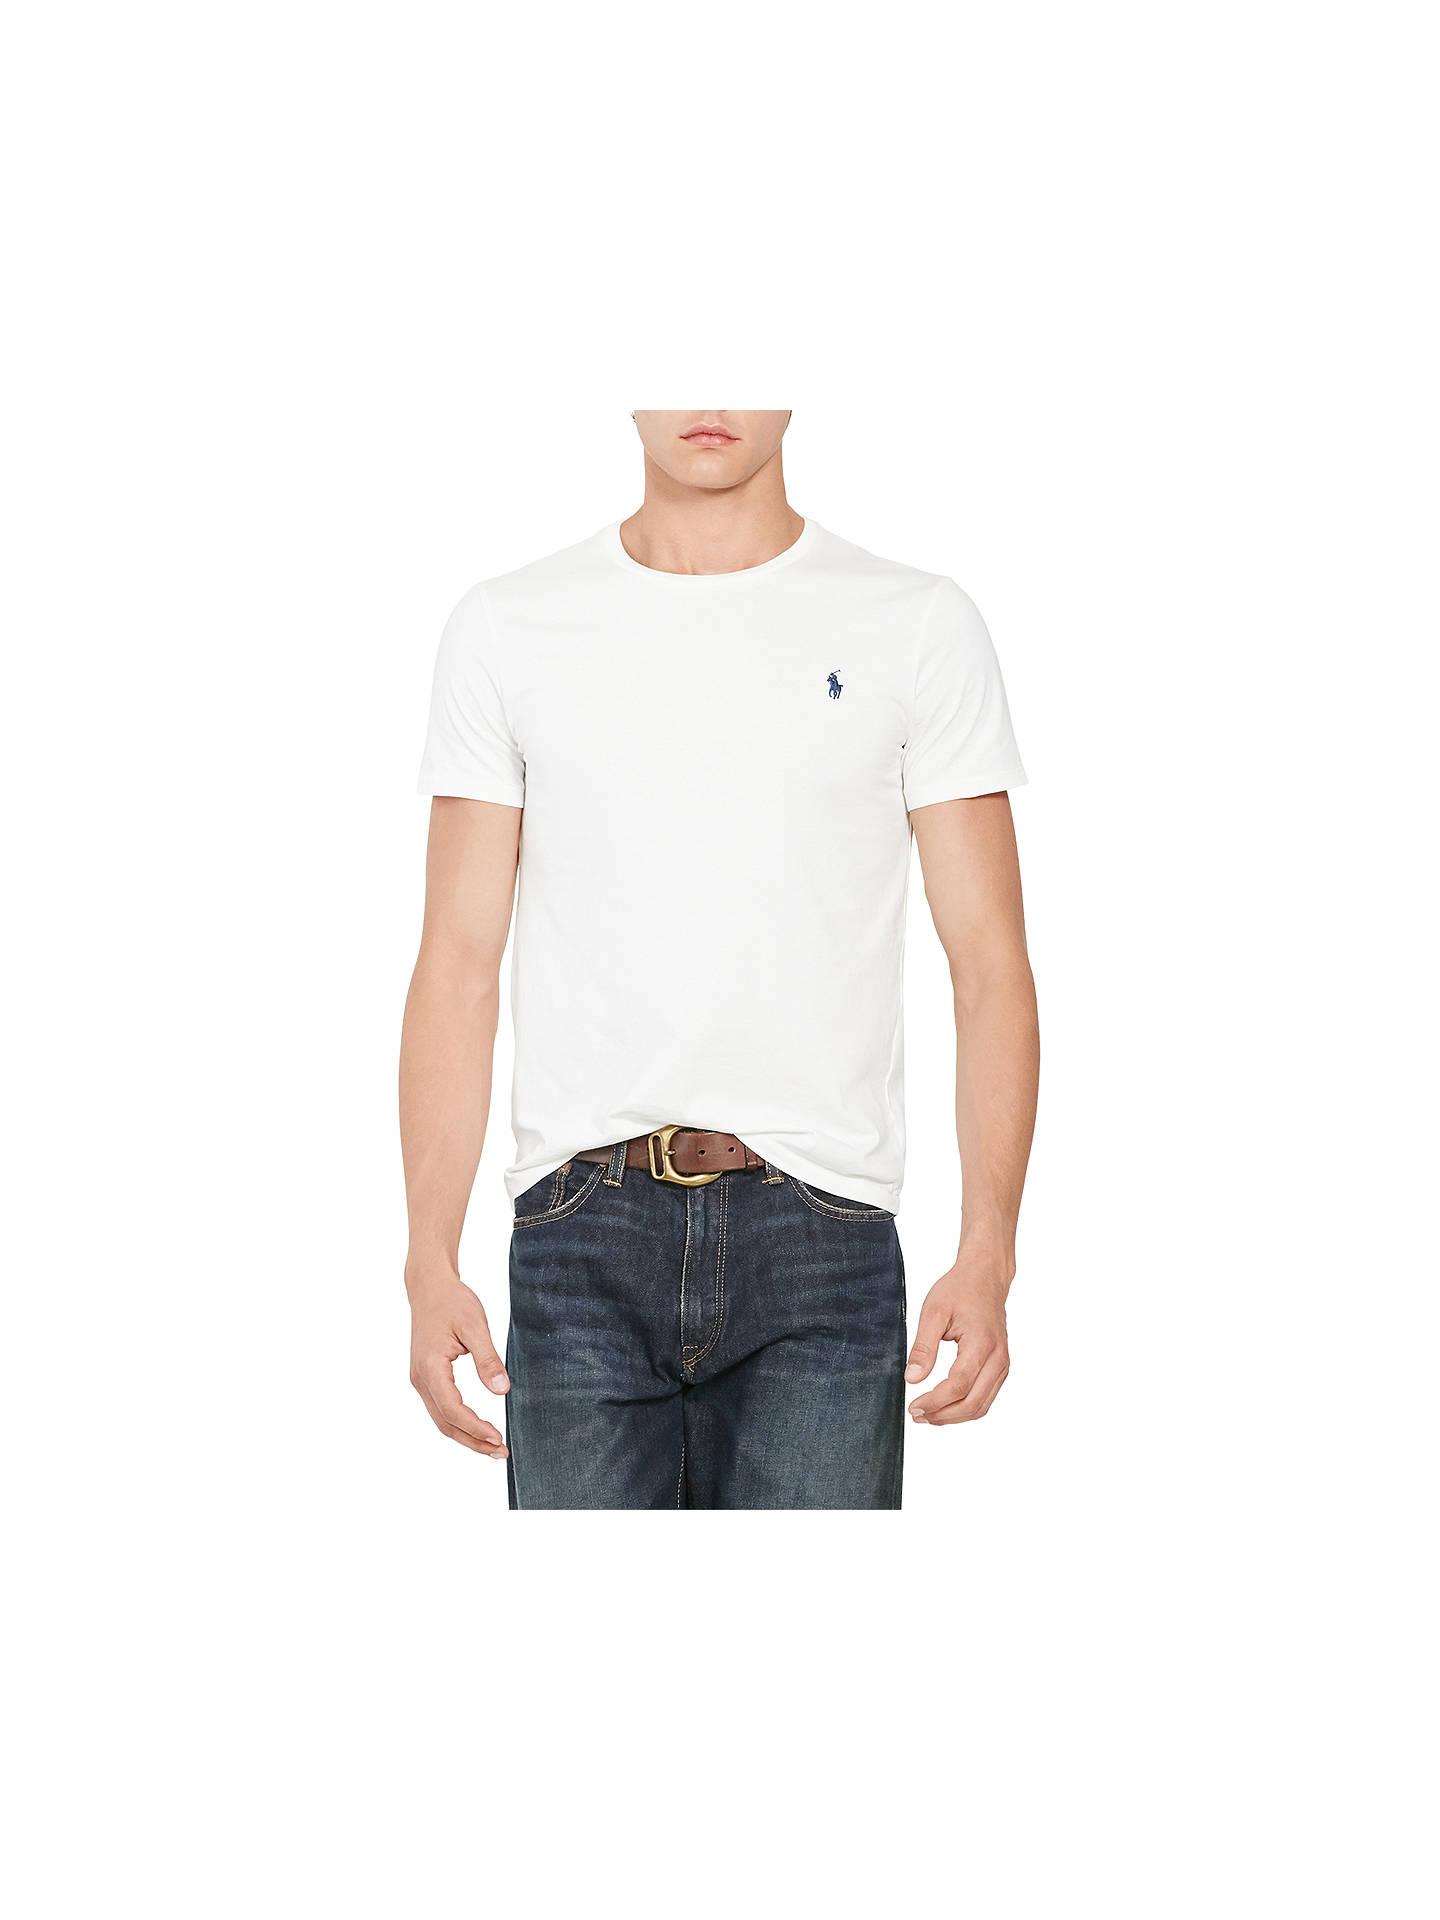 BuyPolo Ralph Lauren Crew Neck T-Shirt 795e84f59406